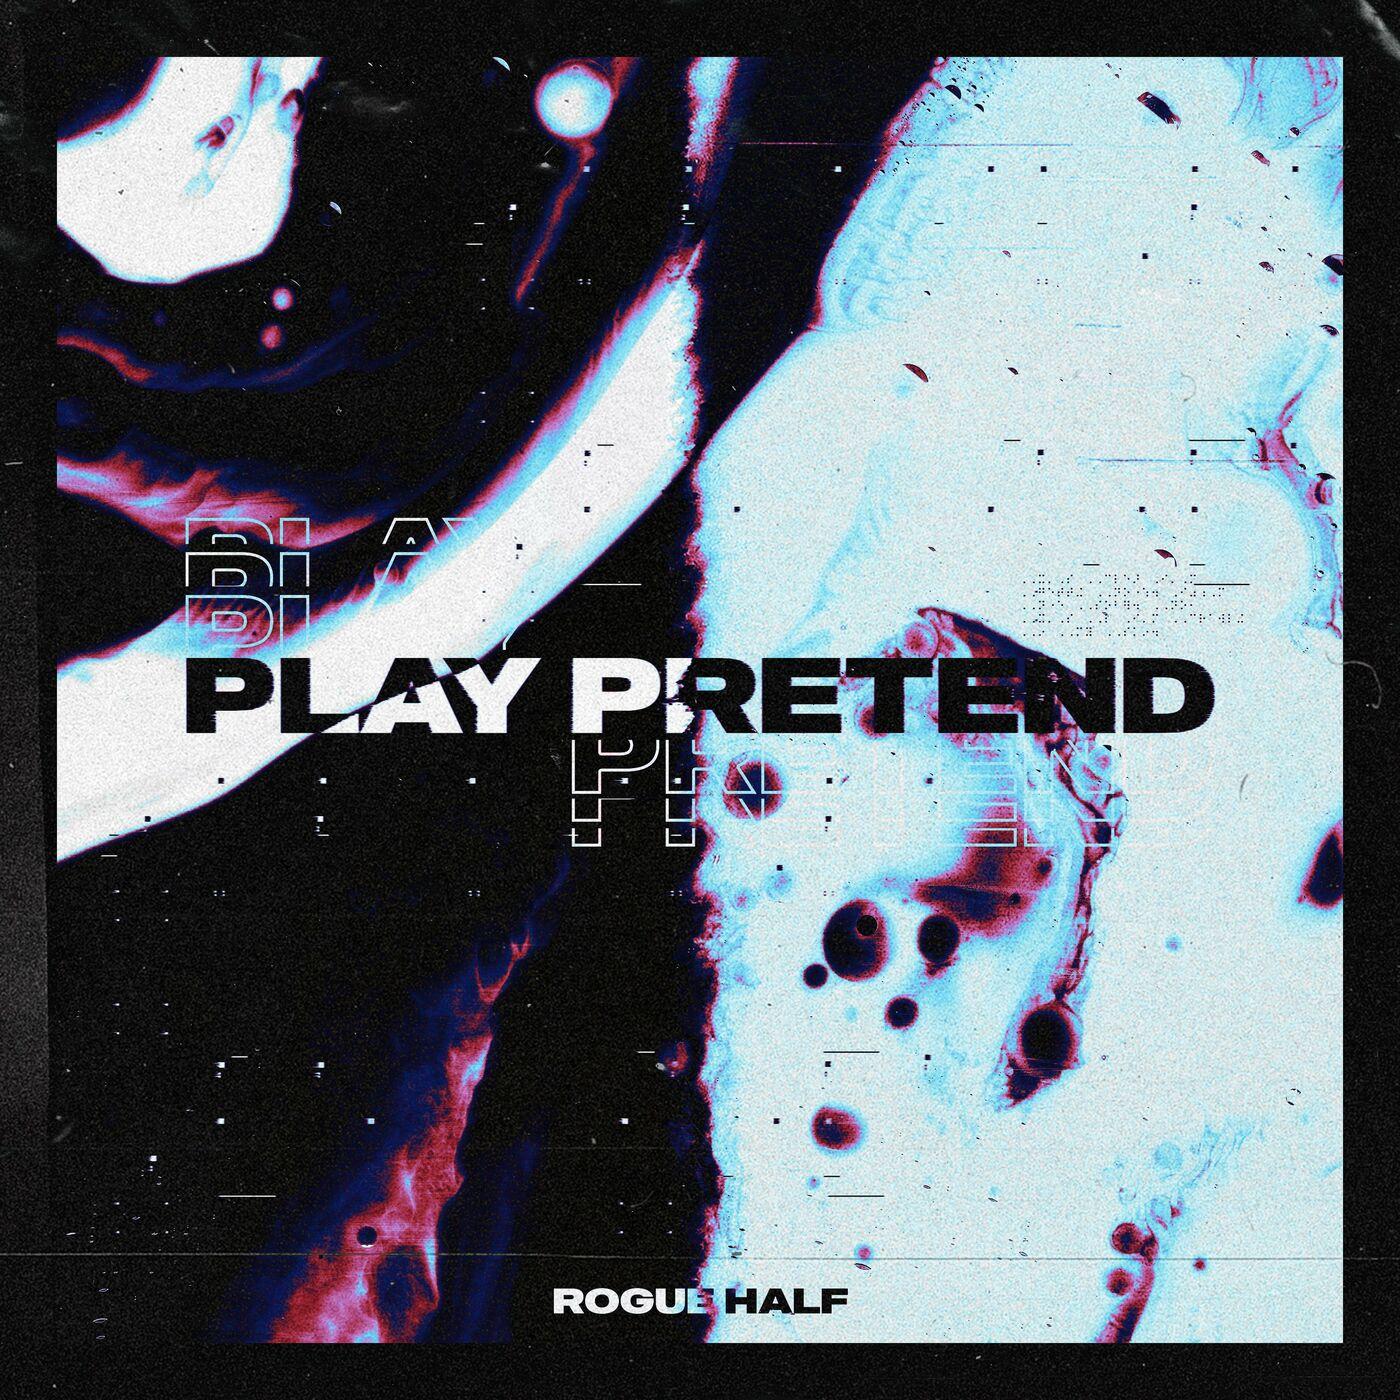 Rogue Half - Play Pretend [single] (2020)